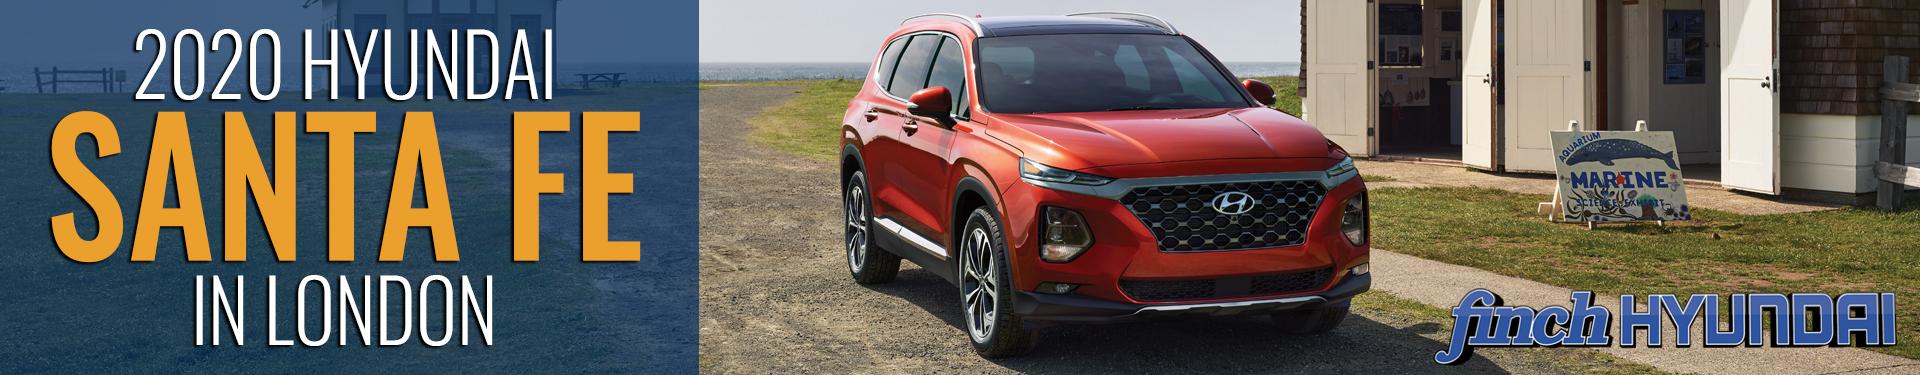 Discover the new 2020 Hyundai Santa Fe in London Ontario, Sarnia, Stratford & Woodstock from Finch Hyundai, new SUV in London